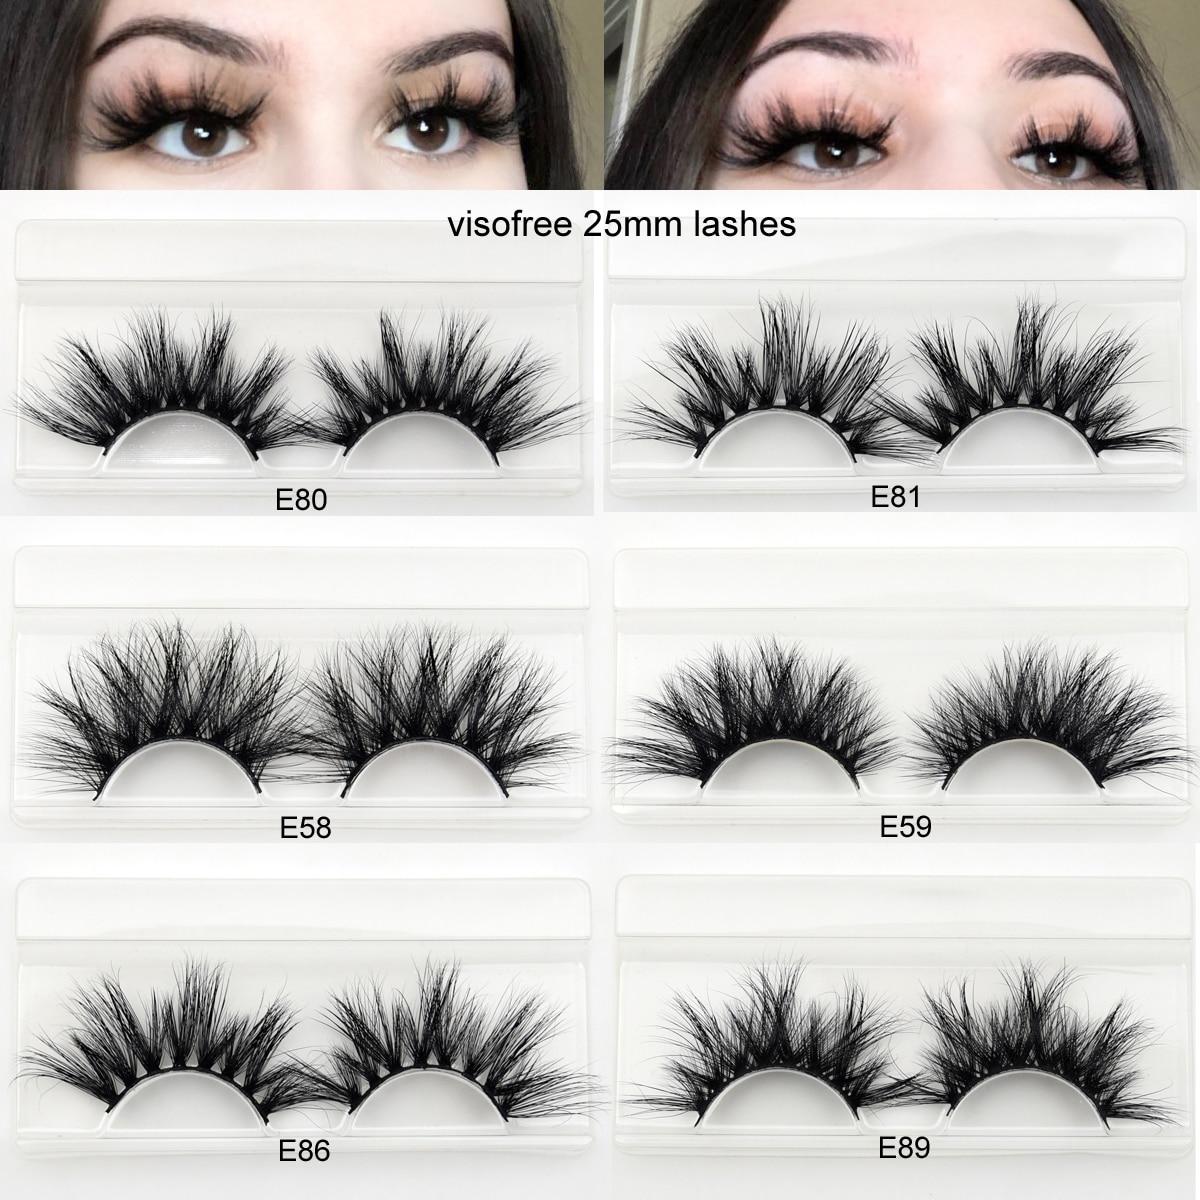 Visofree 25mm Lashes 3D Mink Eyelashes Cruelty Free 25mm Mink Lashes Handmade Crisscross Dramatic Eyelashes Faux Cil Makeup Lash